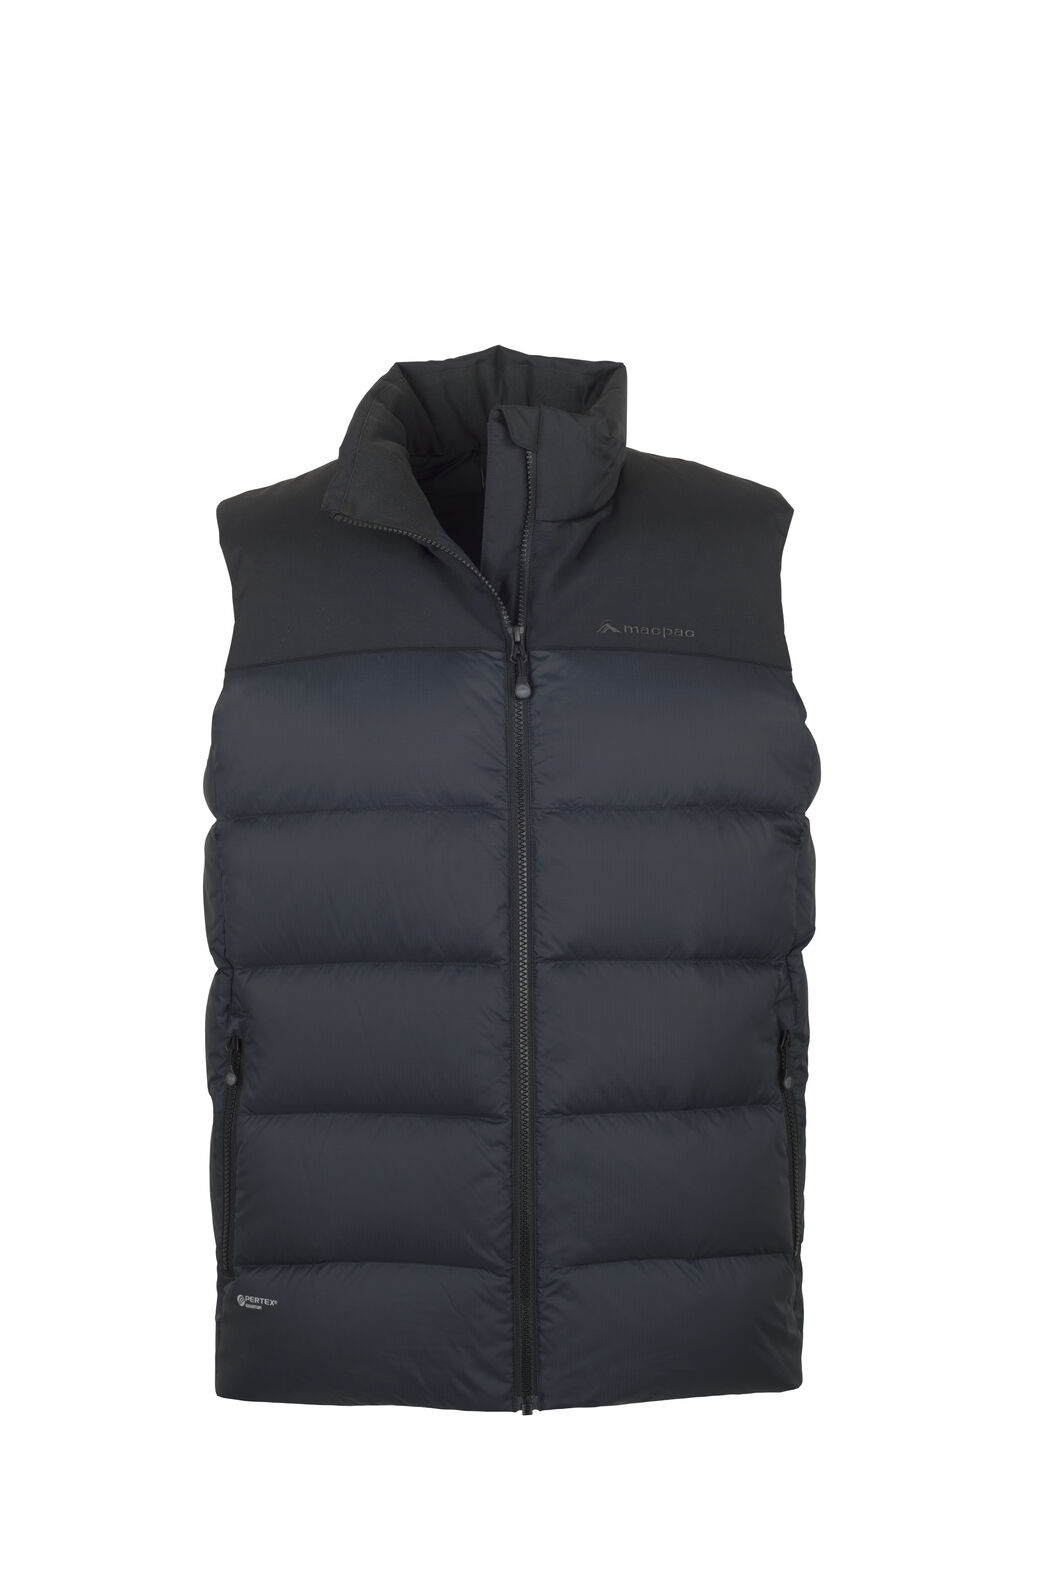 Macpac Ember Vest - Men's, Black, hi-res